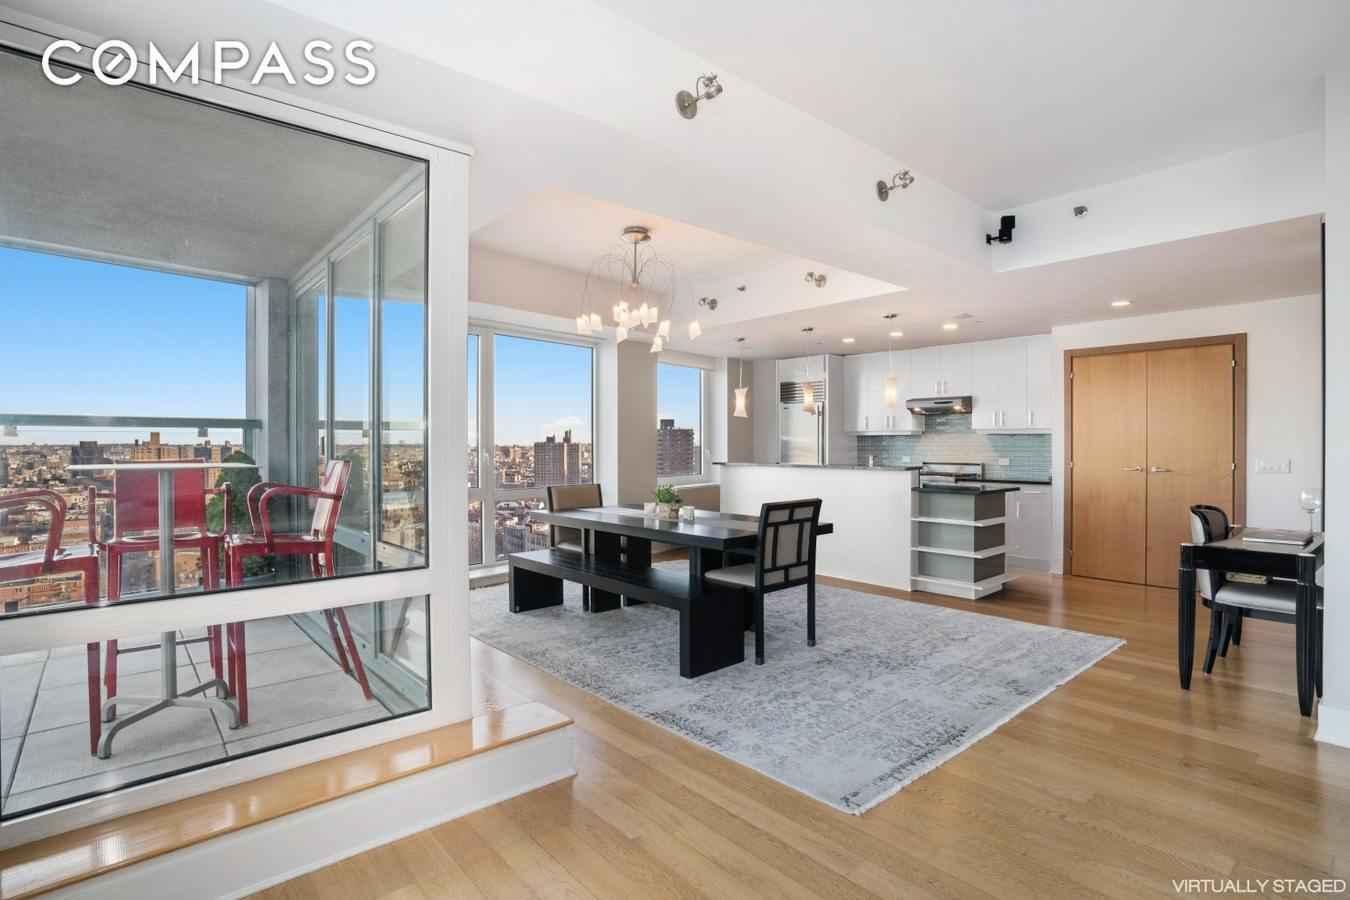 Apartment for sale at 440 Kent Avenue, Apt PH-2C